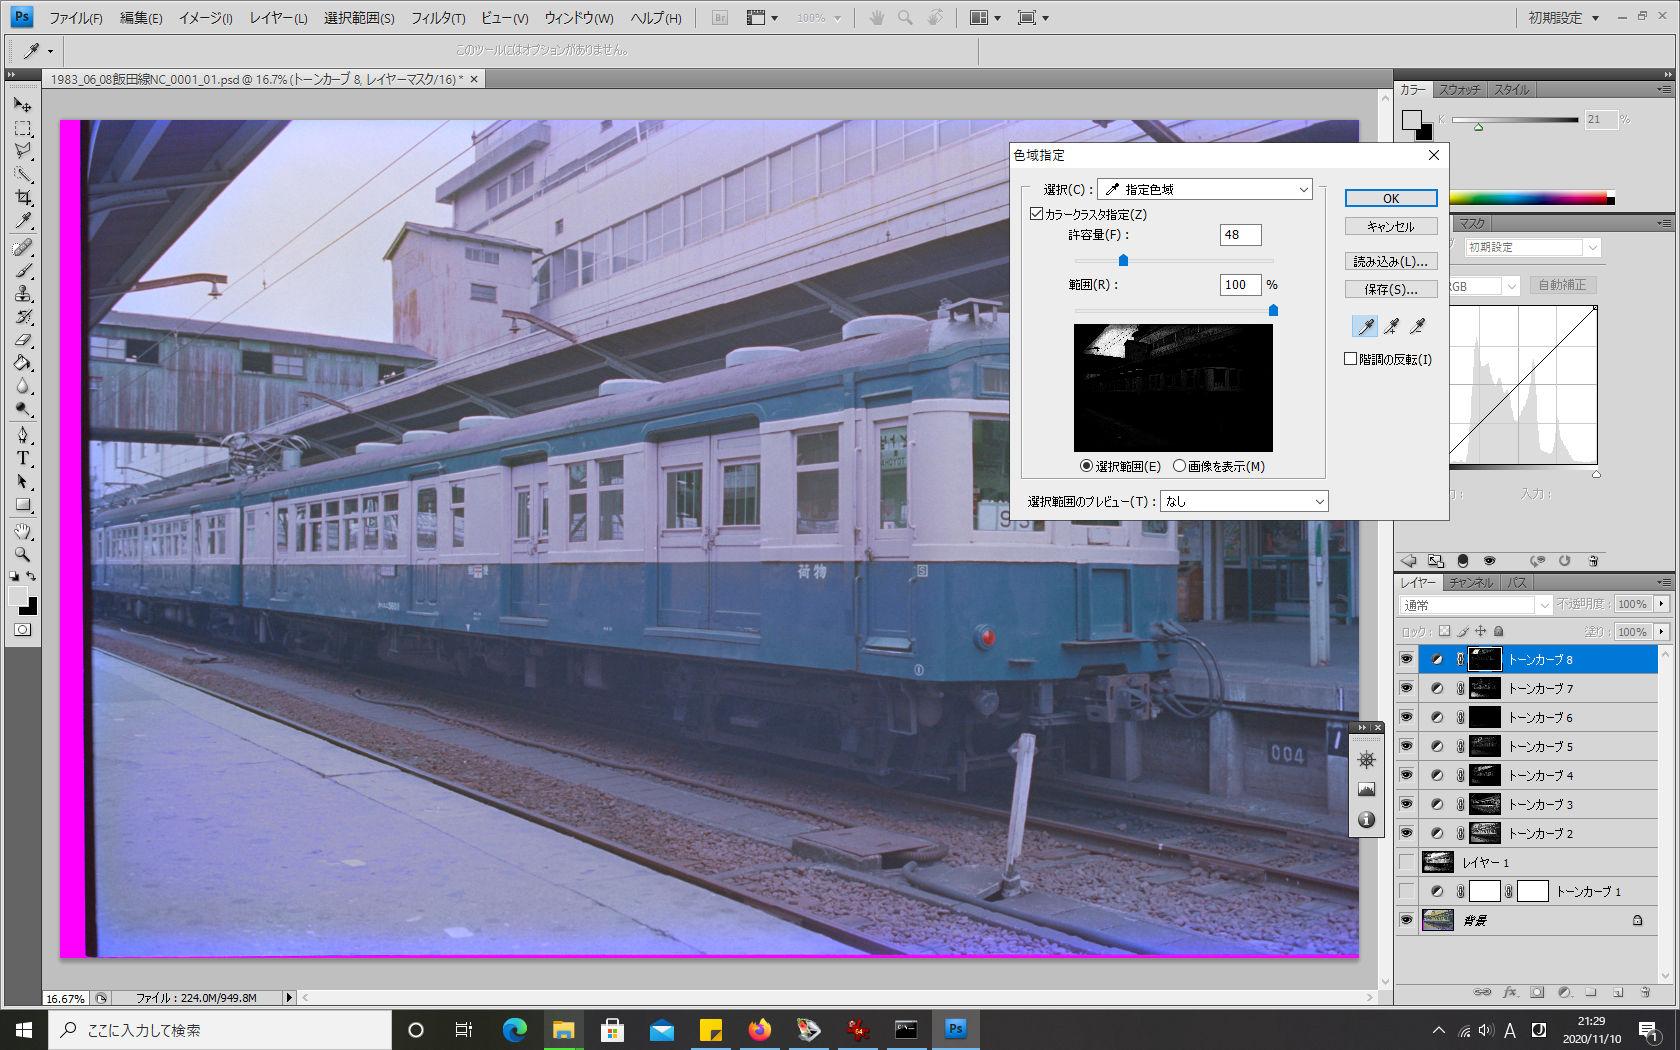 f:id:yasuo_ssi:20201110215449j:plain